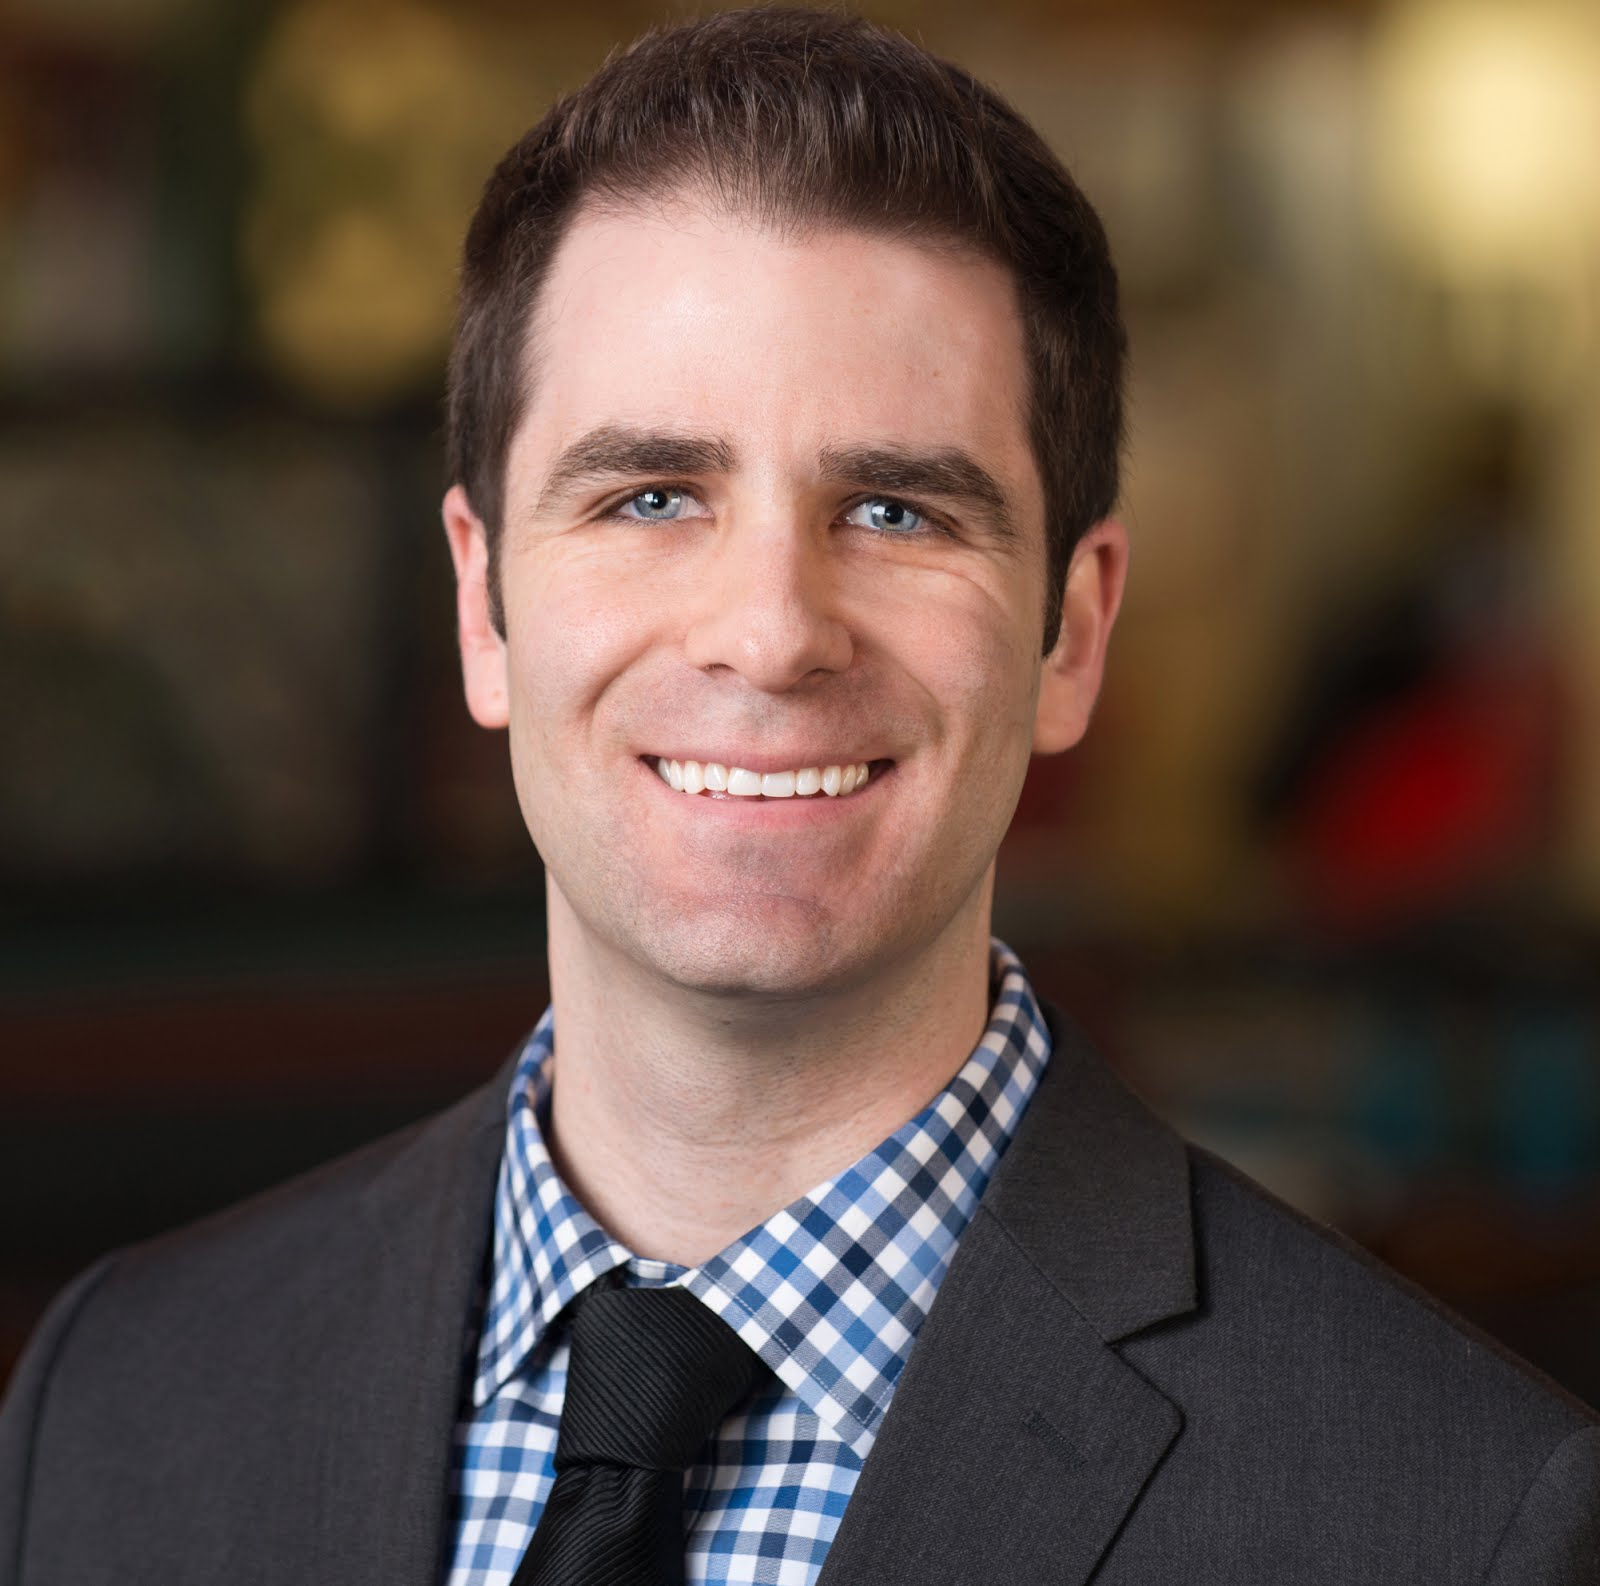 Nick Scarpino